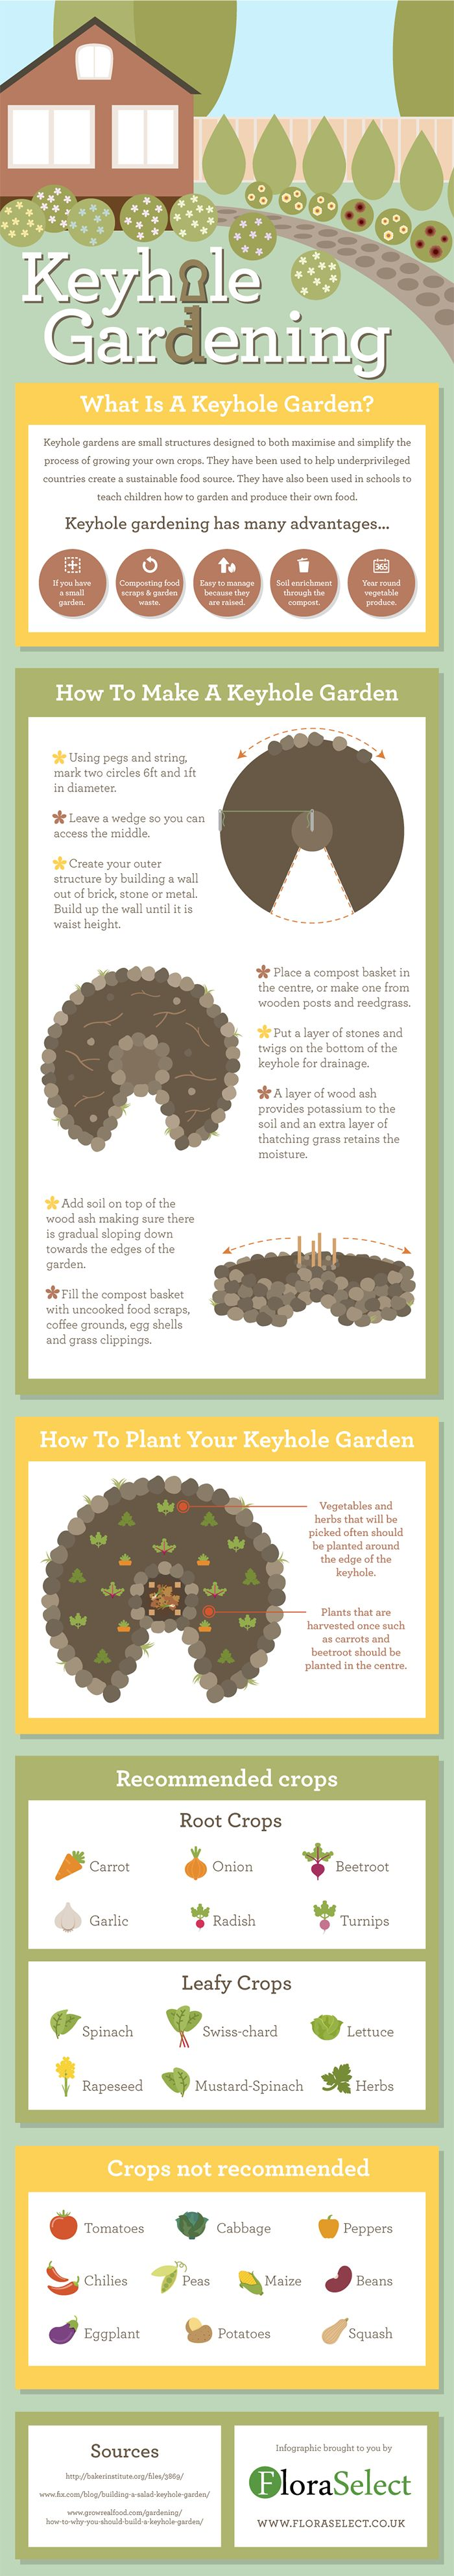 How To Build a Keyhole Garden   Big Blog Of Gardening